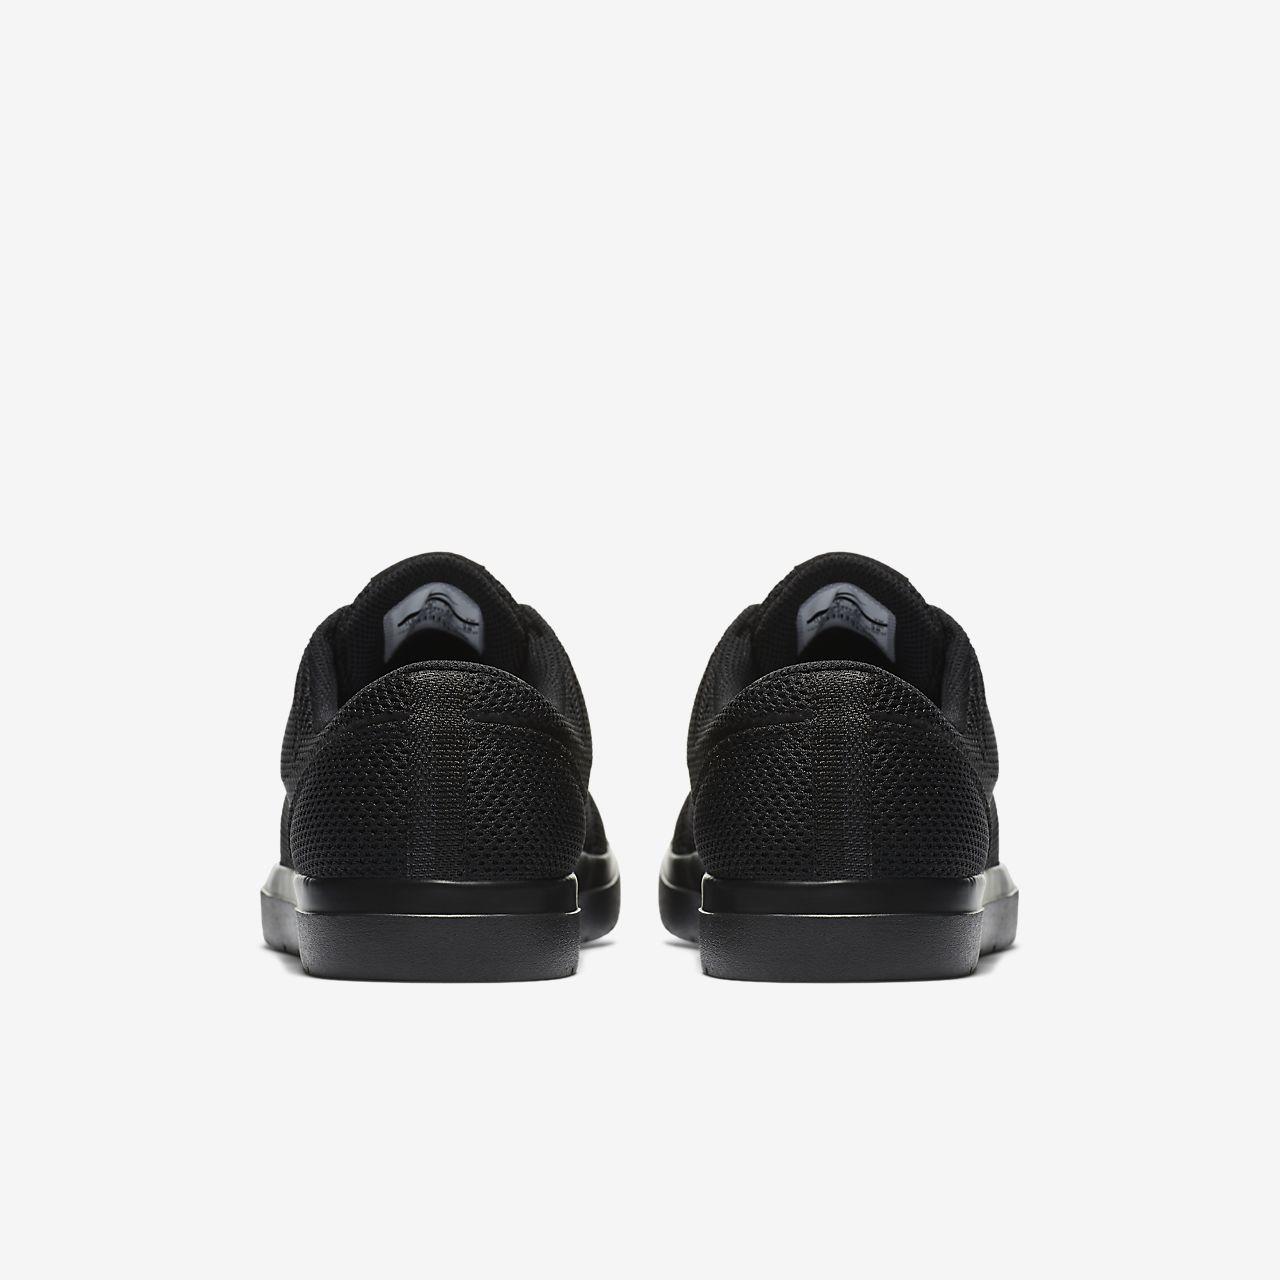 promo code f84a6 b787b ... Nike SB Portmore II Ultralight Men s Skateboarding Shoe